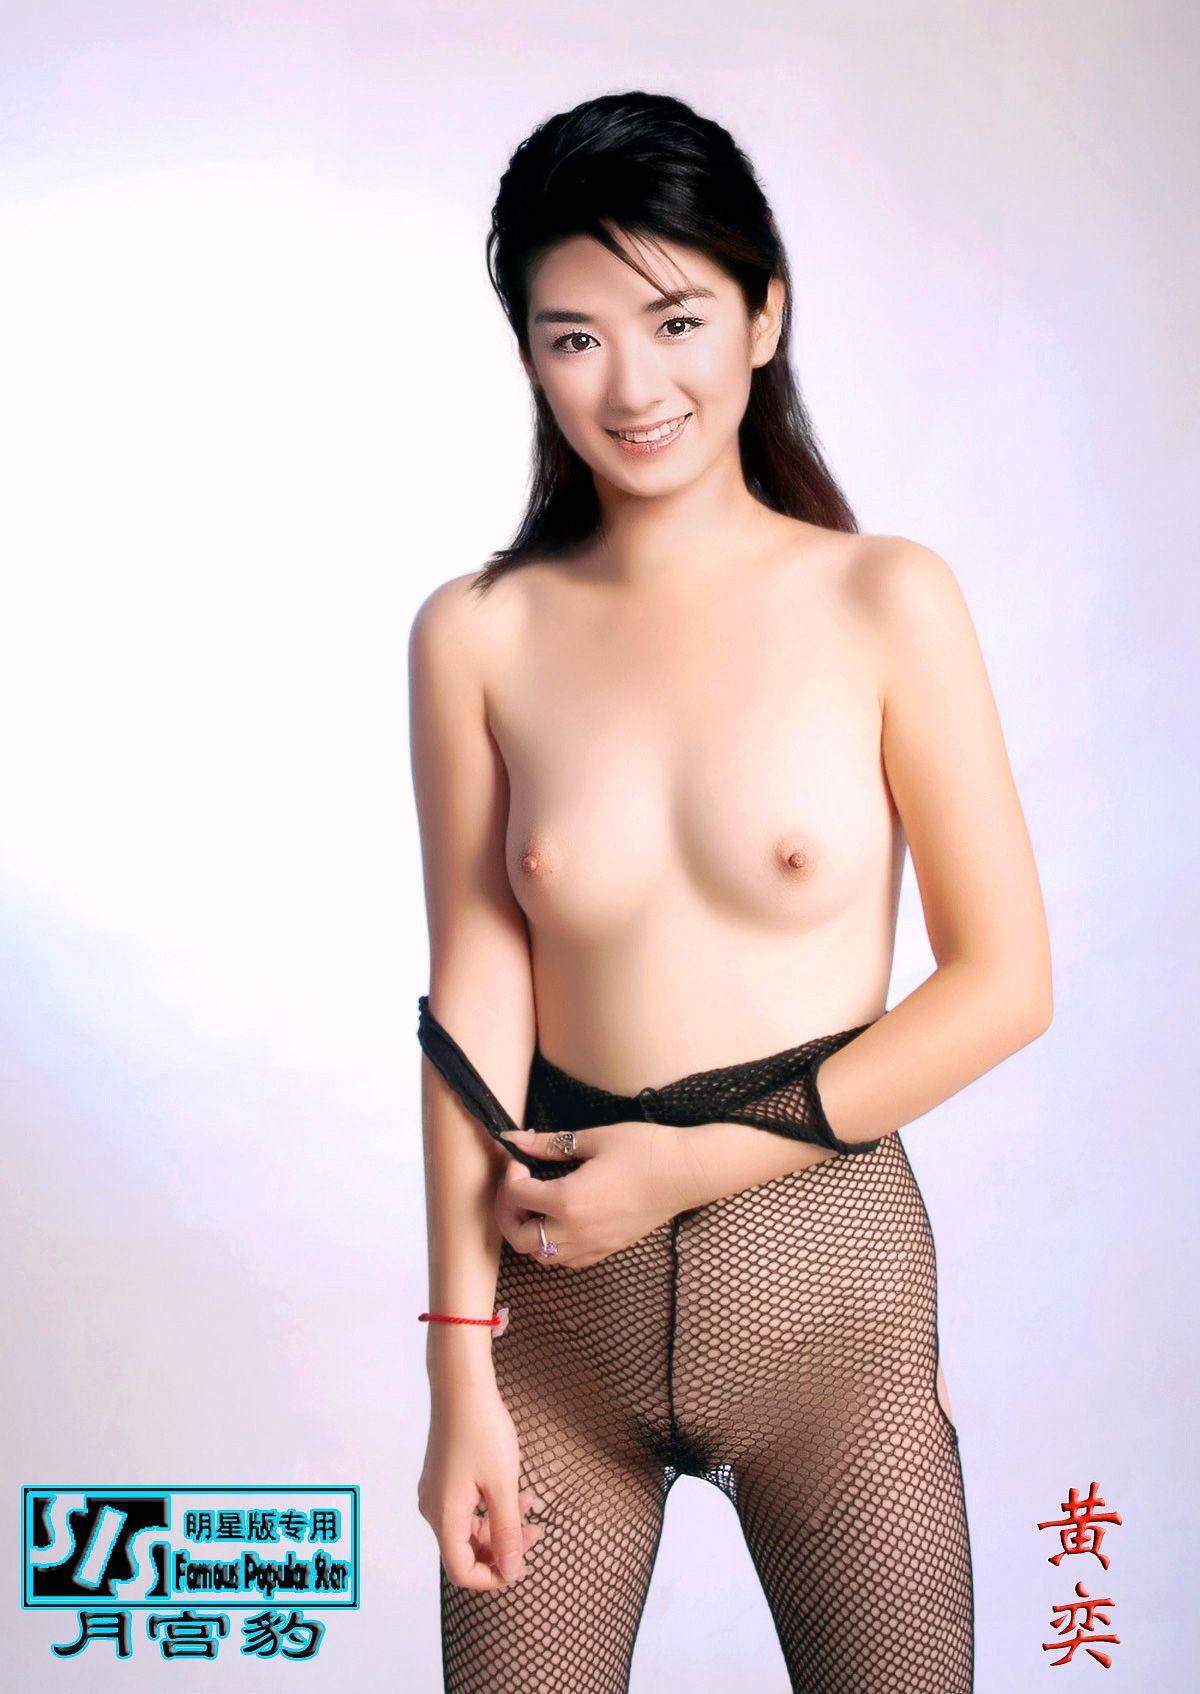 Sexinsex 明星合成黄奕 jp.mp4jpg.icu